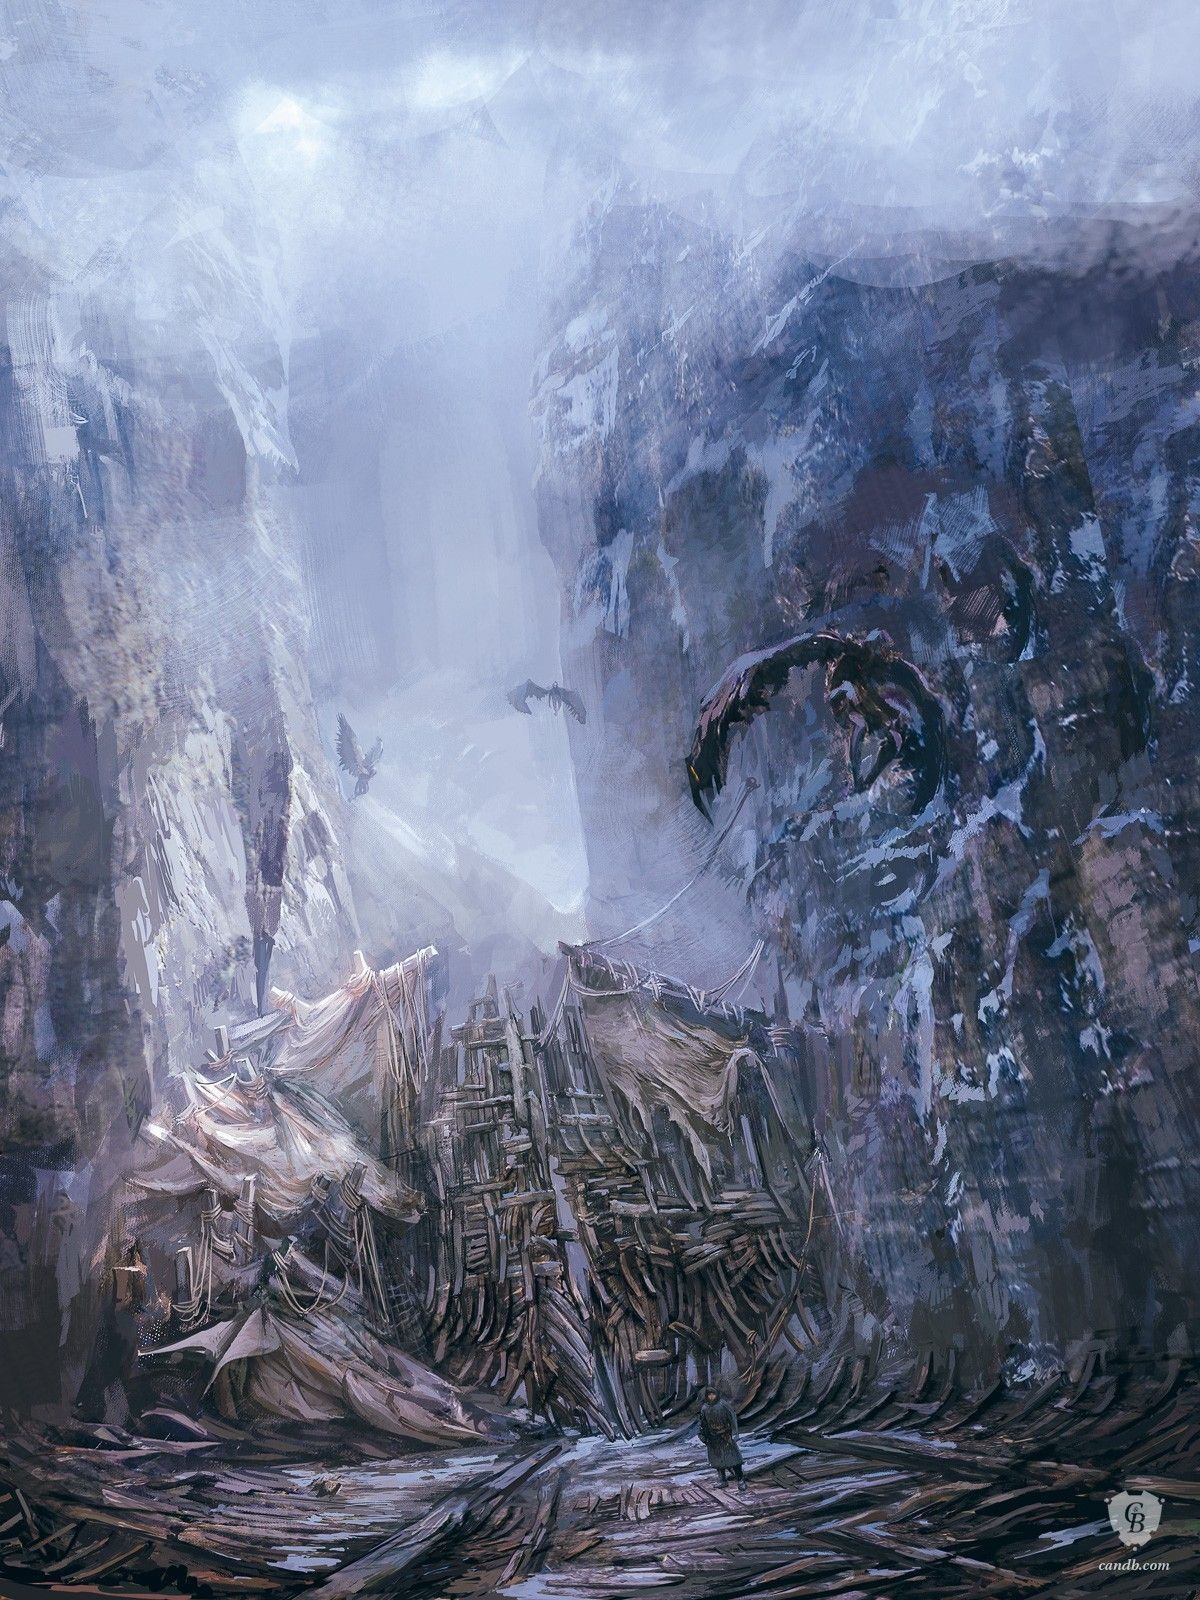 Artwork Skellige Gate - Witcher 3 | The Witcher 3 | CD